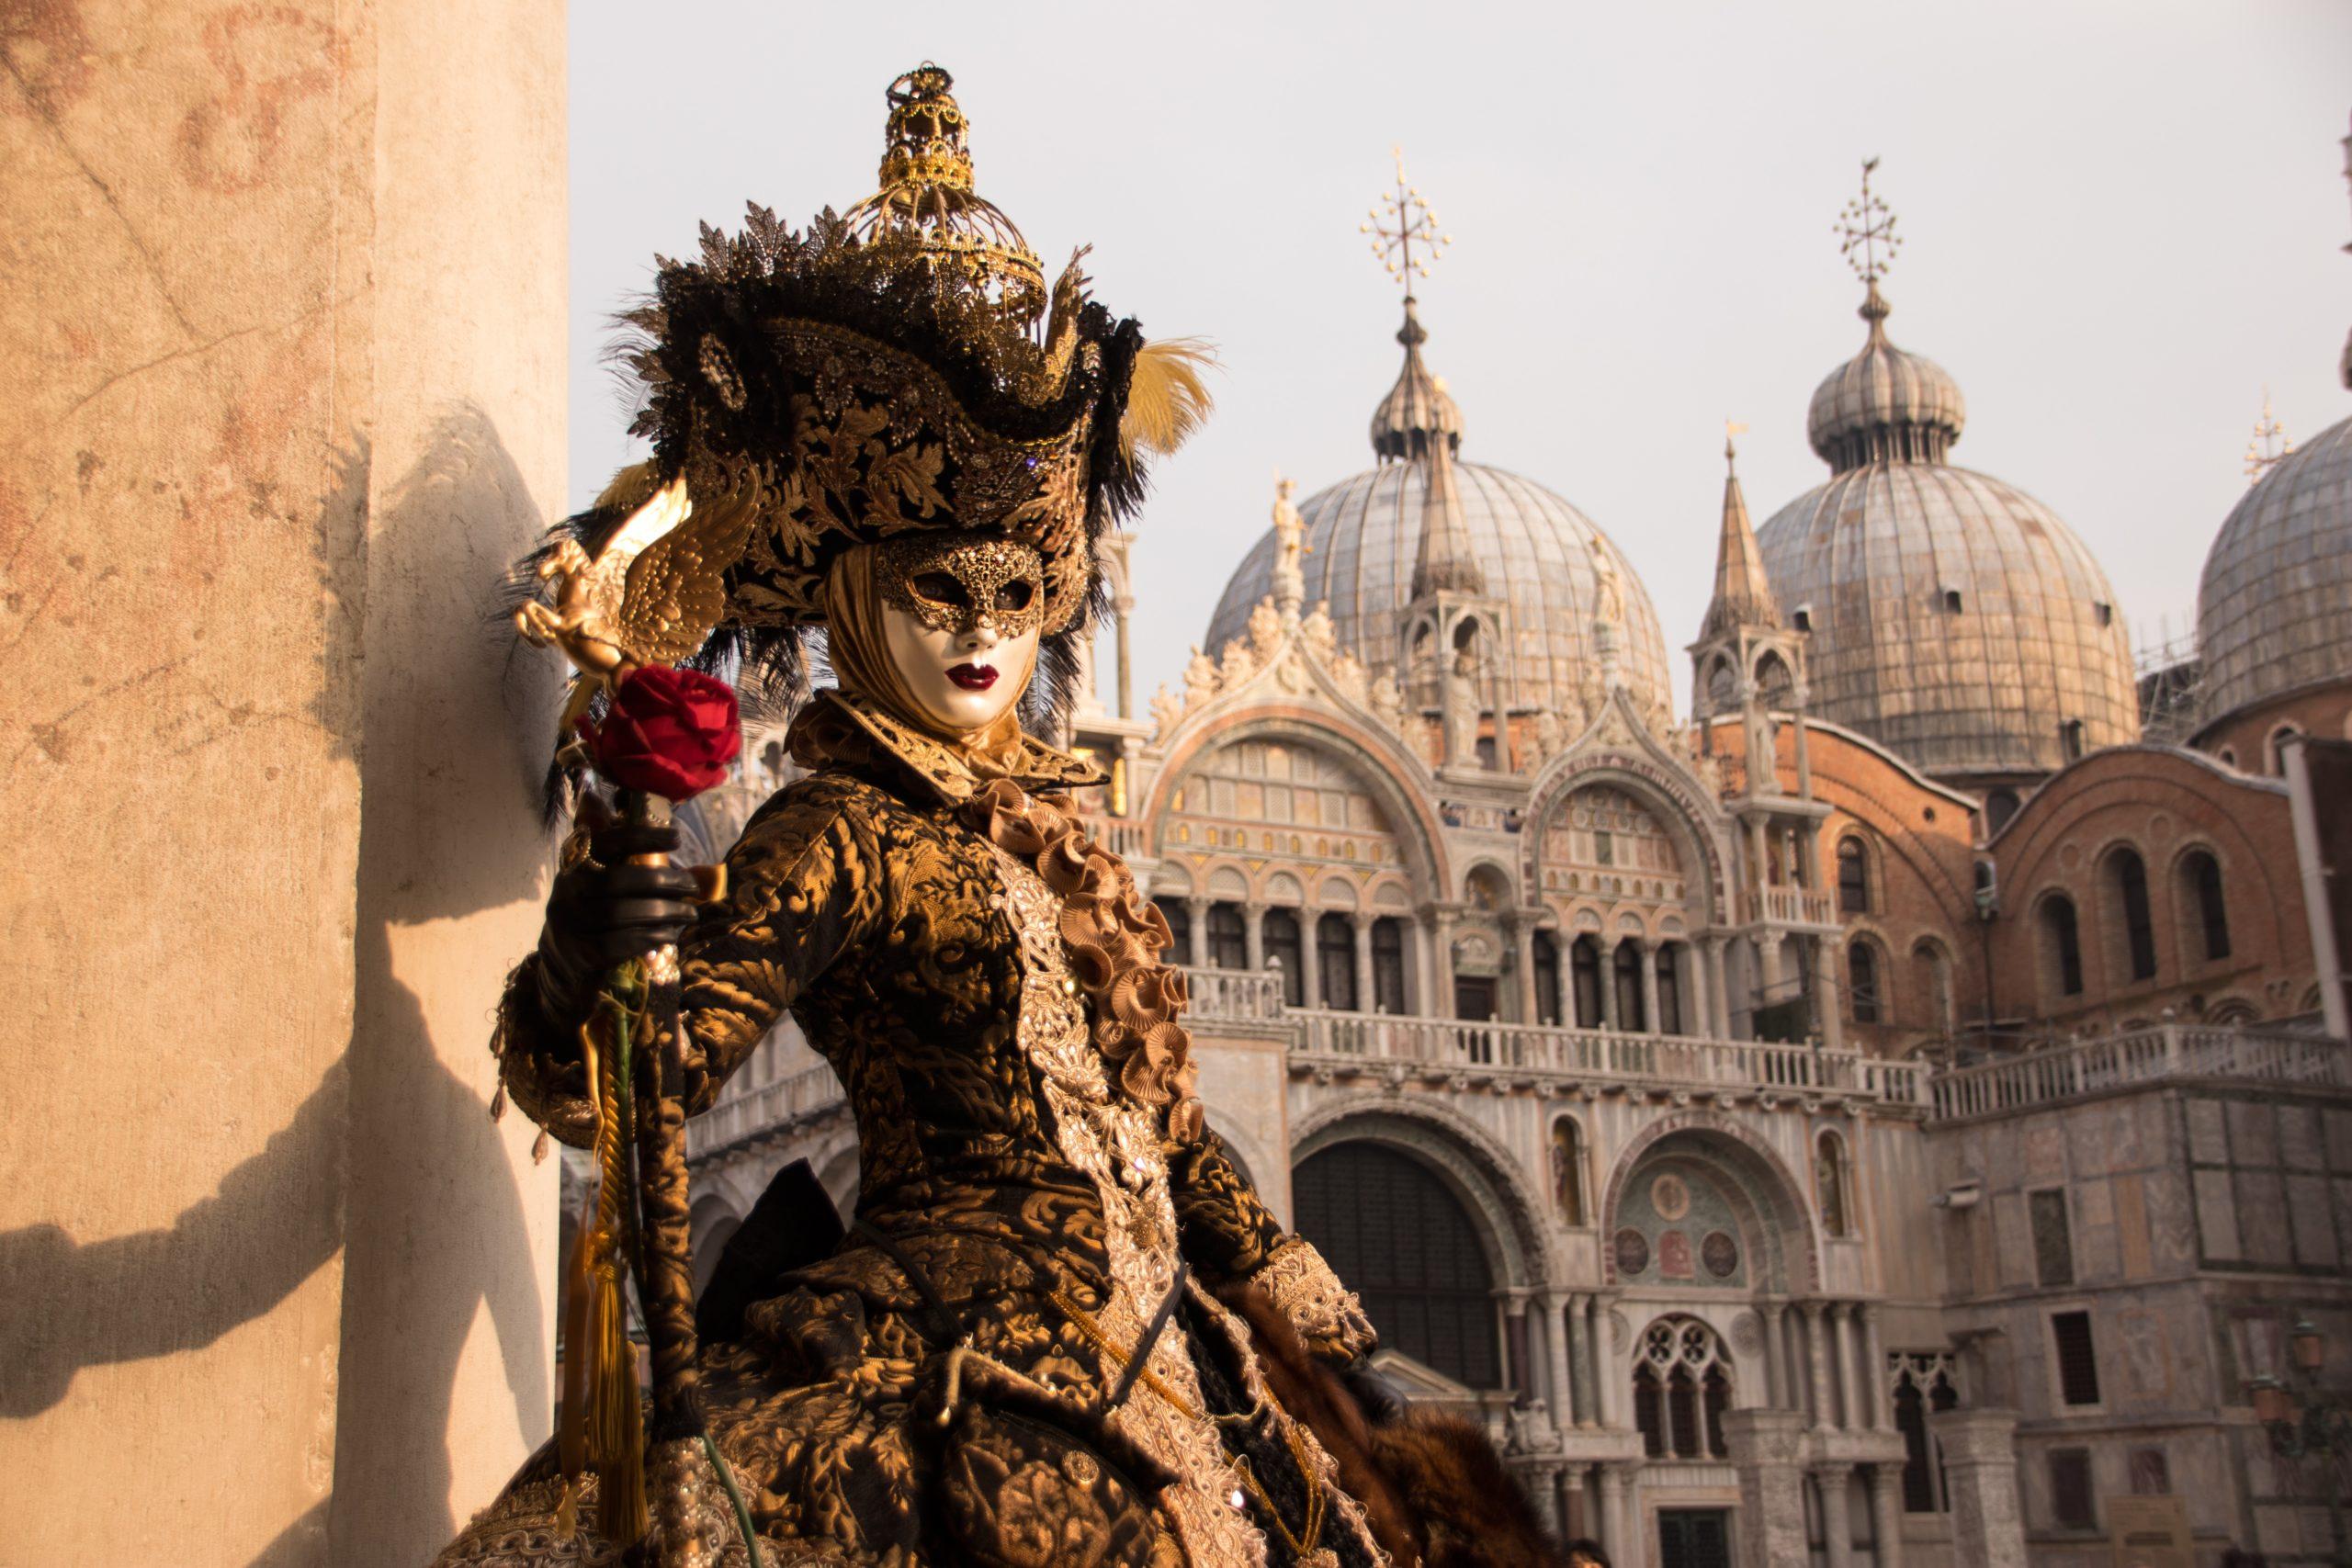 Maschera da carnevale veneziano